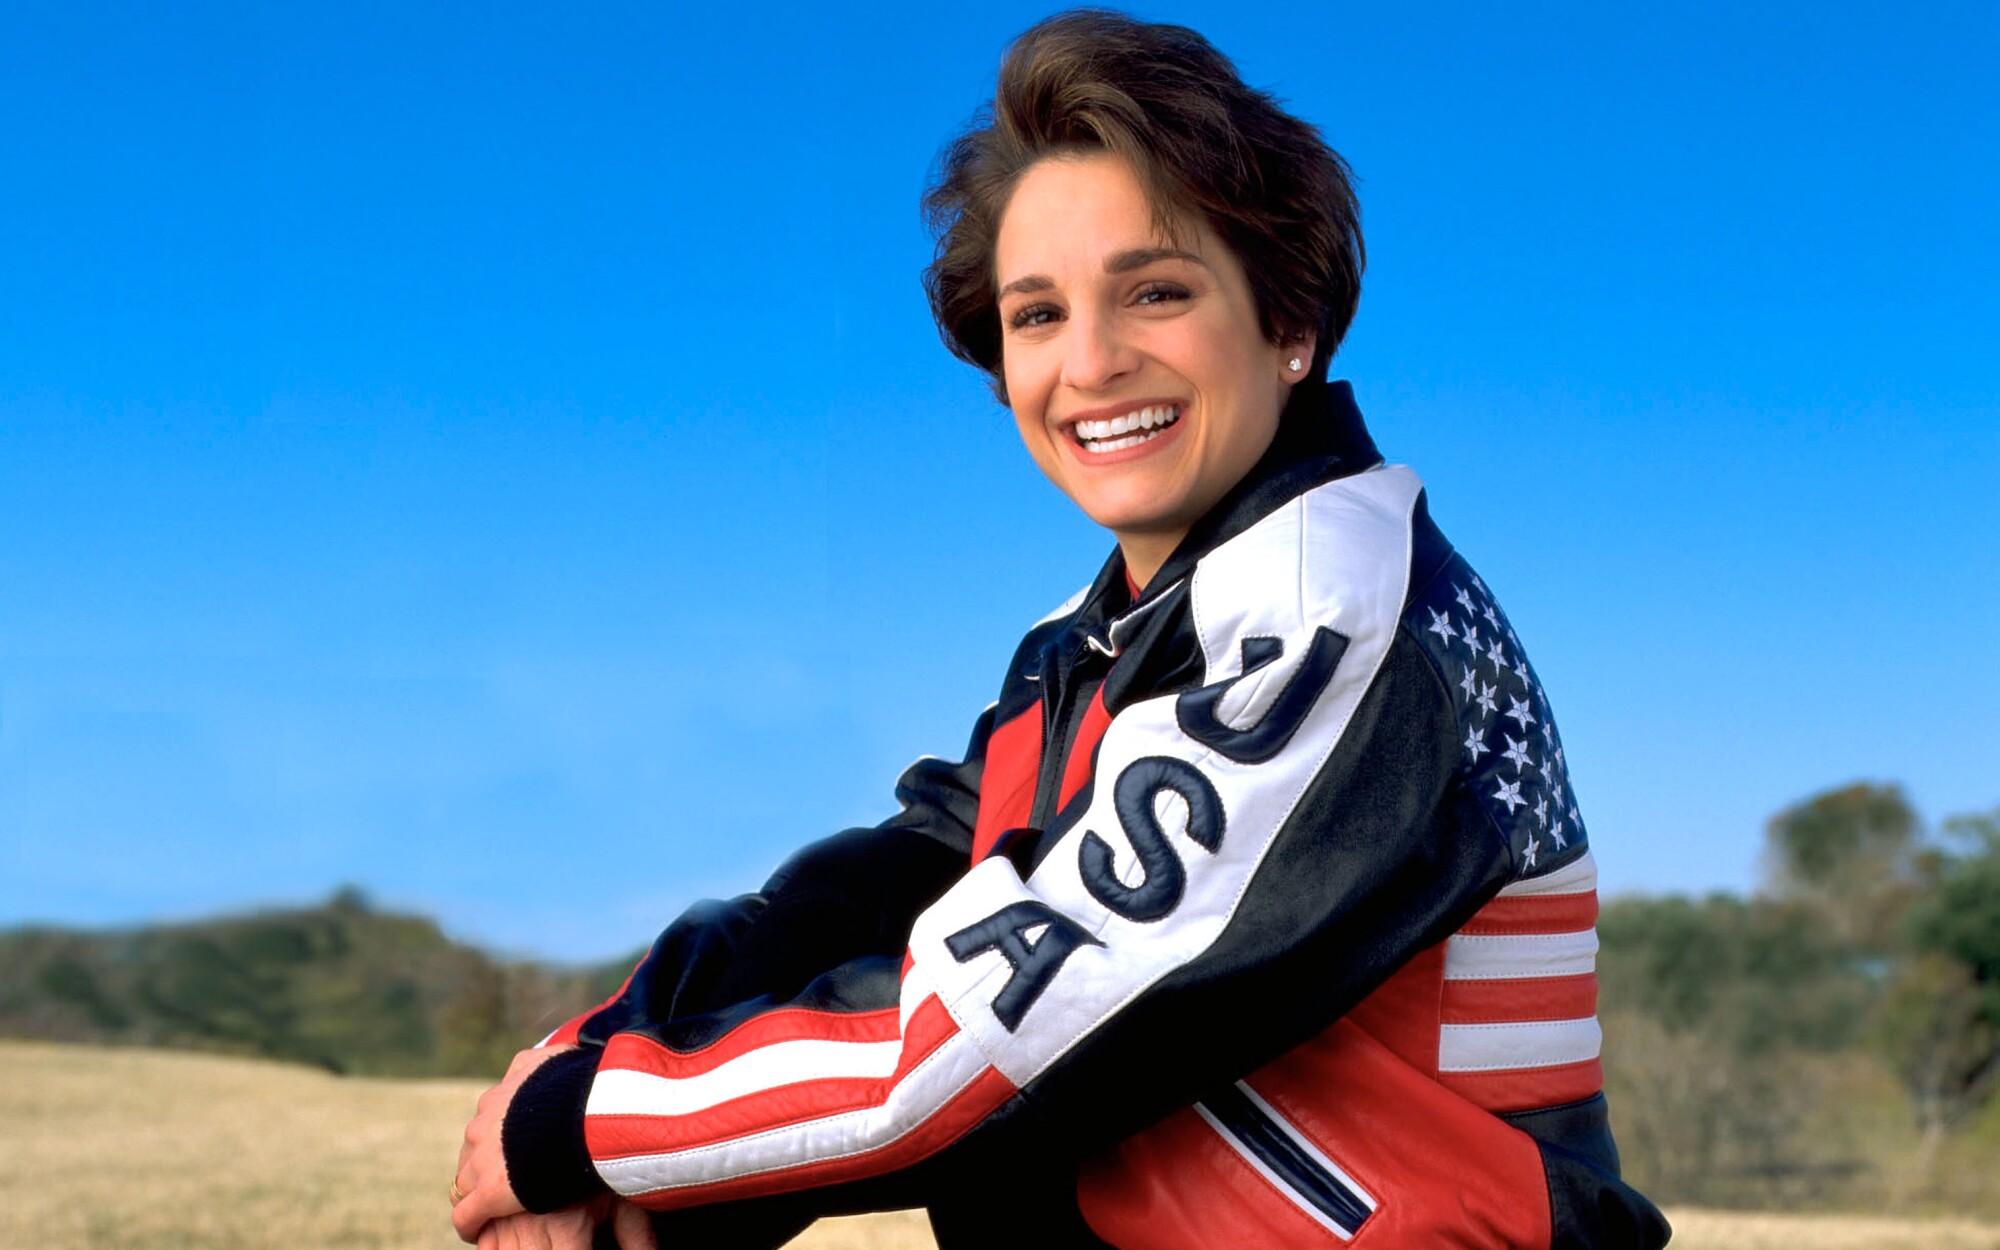 Olympic Gold Medalist - Mary Lou Retton